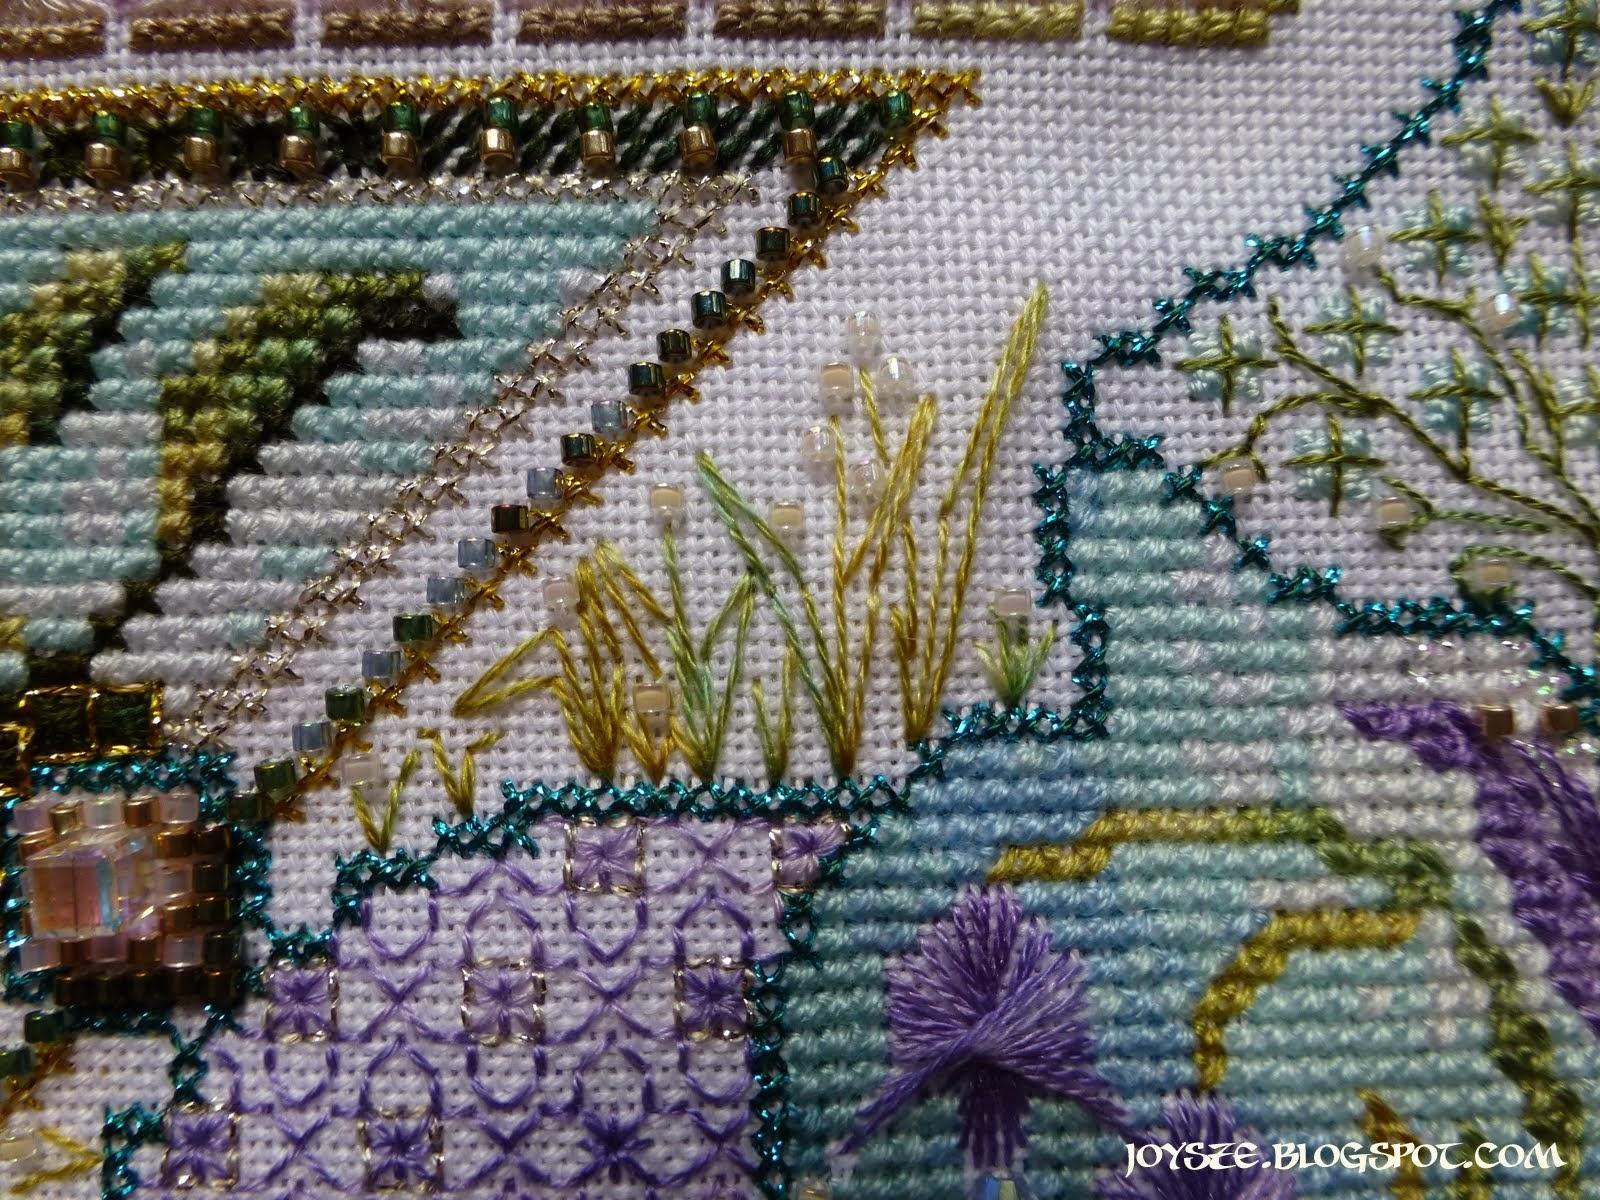 Châtelaine Stitchers Spring Knotgarden Finished